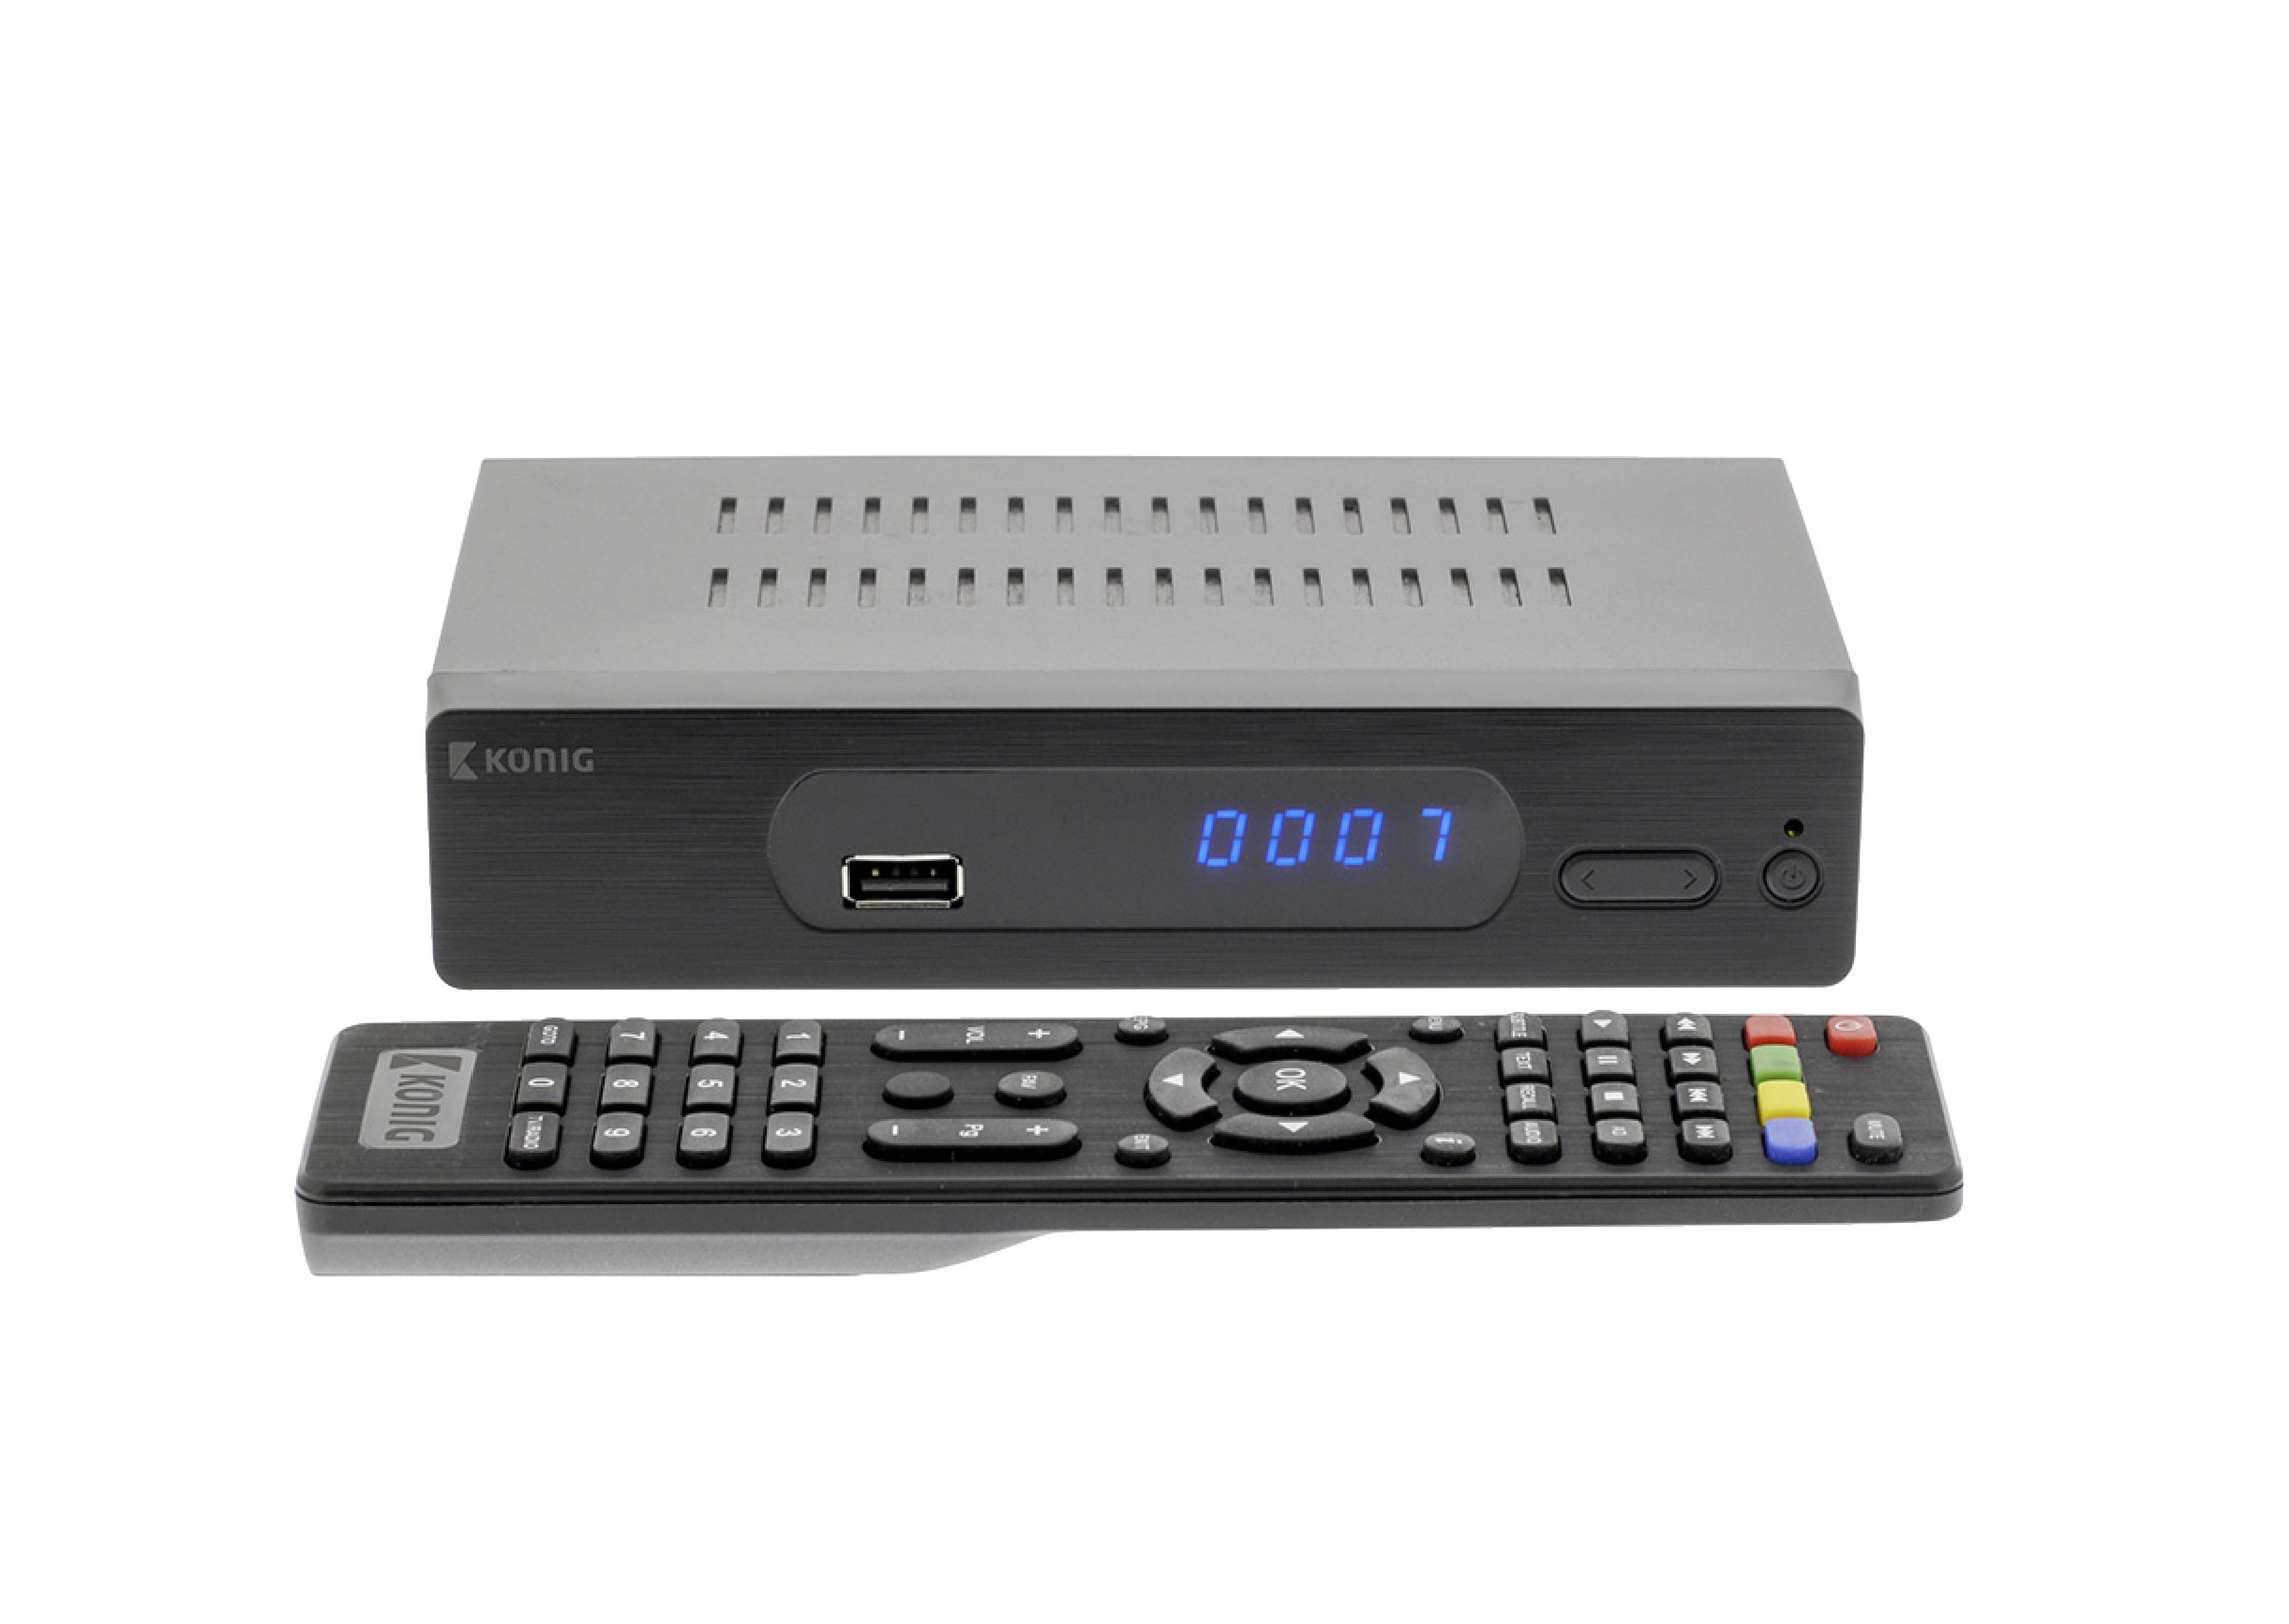 dvb t2 fta20 k nig full hd dvb t2 receiver 1080p hevc. Black Bedroom Furniture Sets. Home Design Ideas